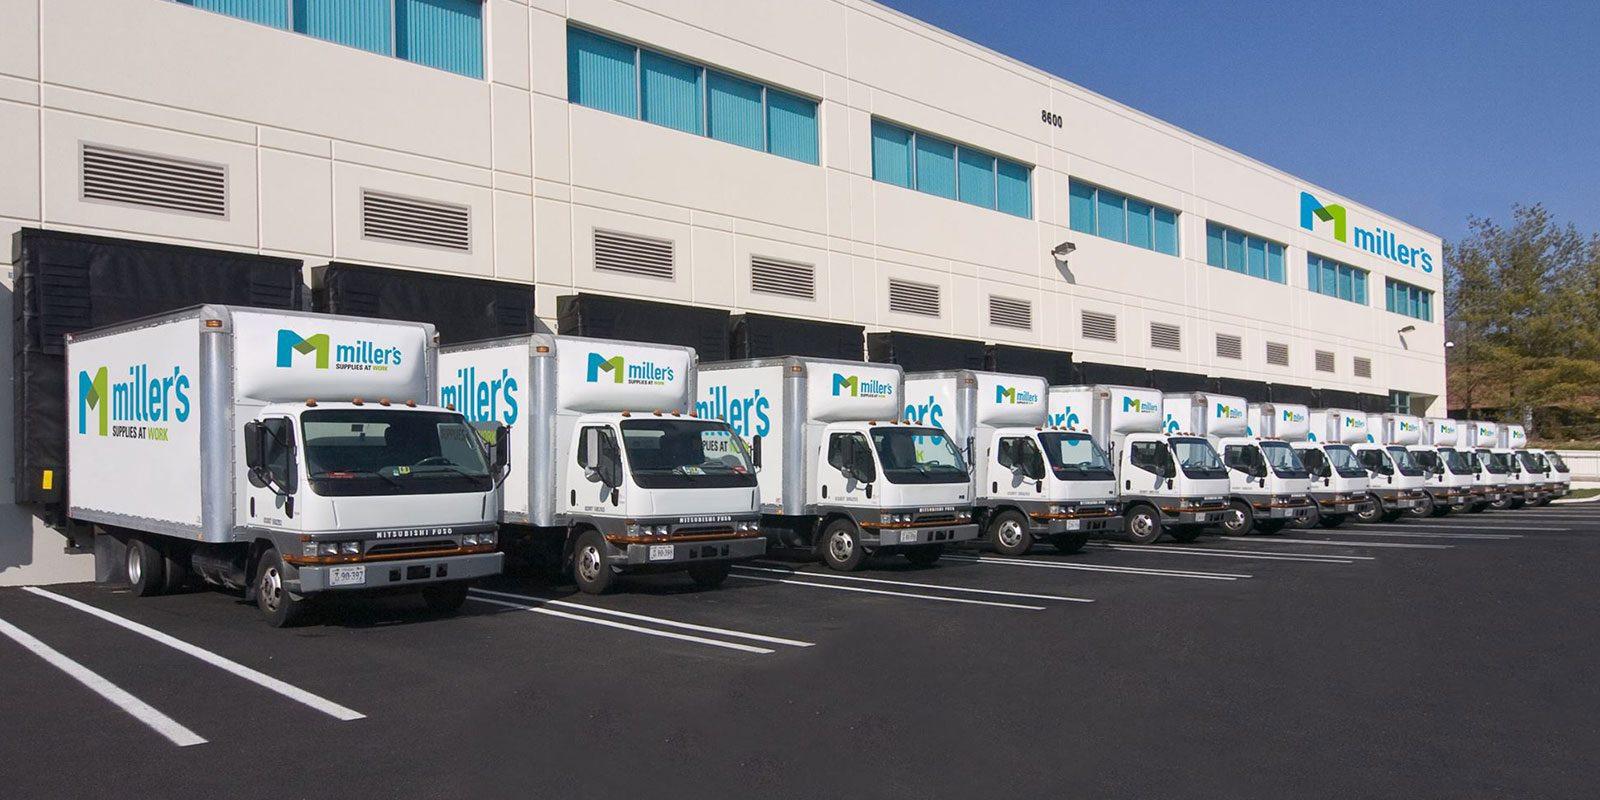 Millers trucks & warehouse